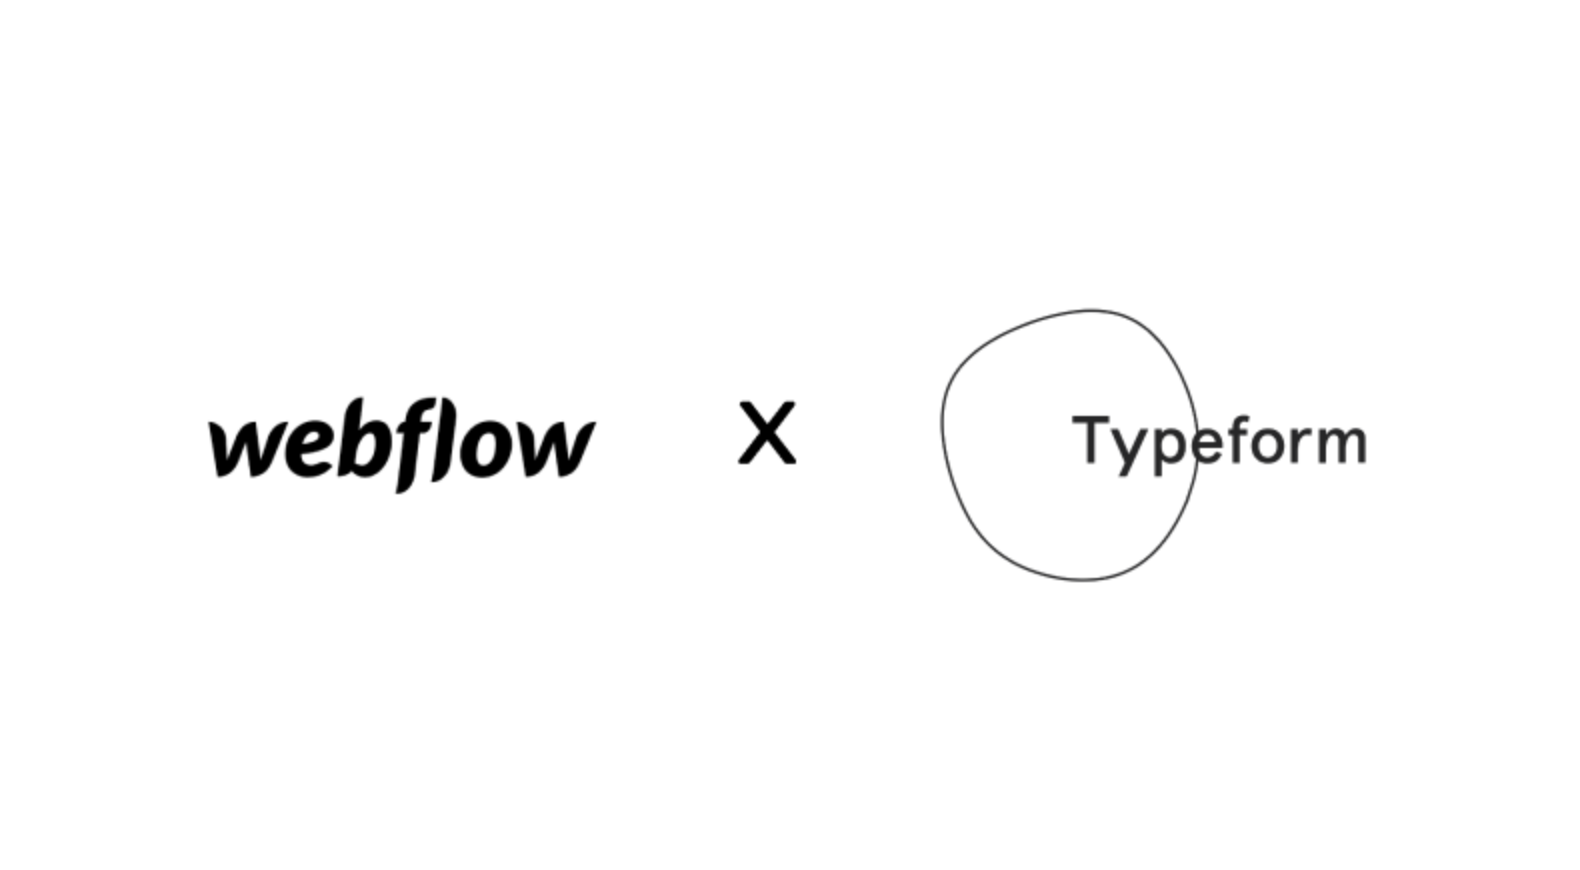 webflow and typeform